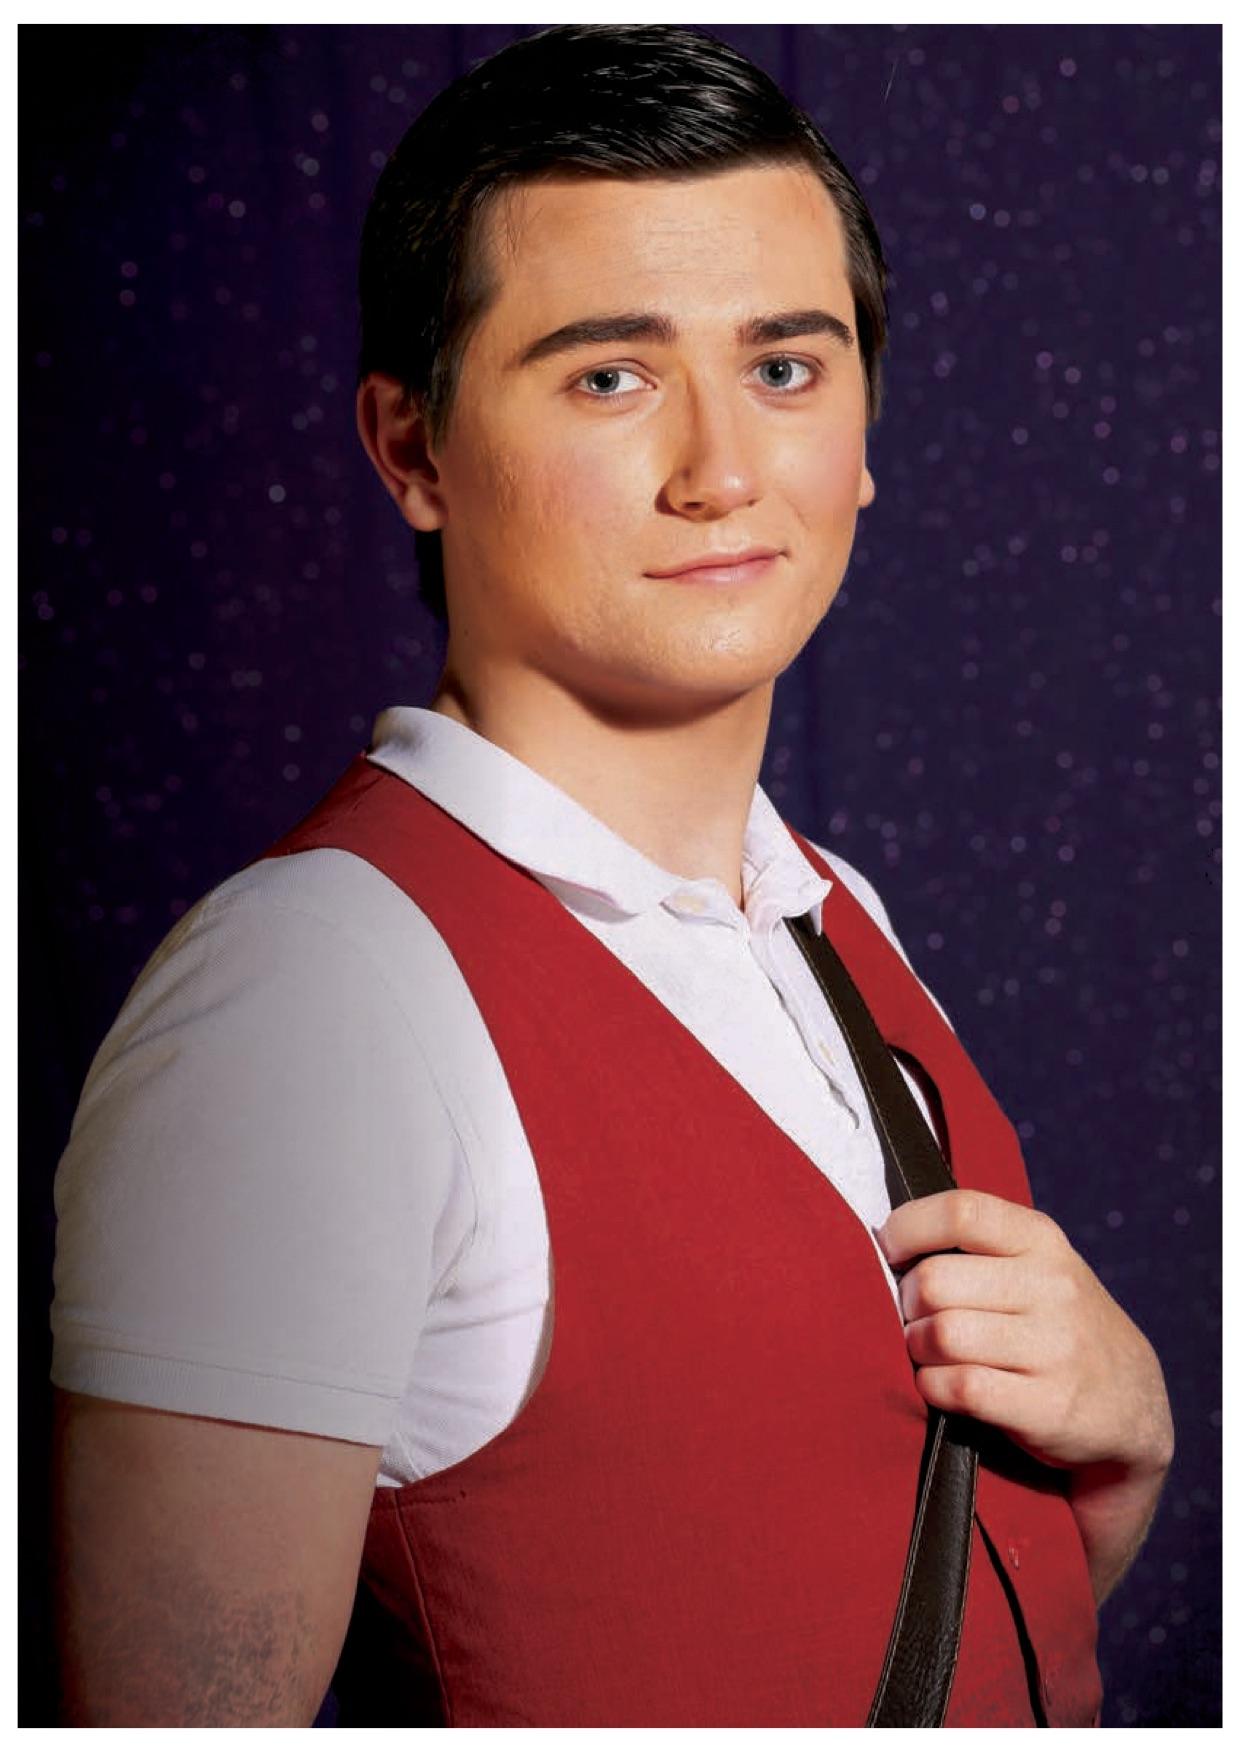 Brady Cronin as Fiyero